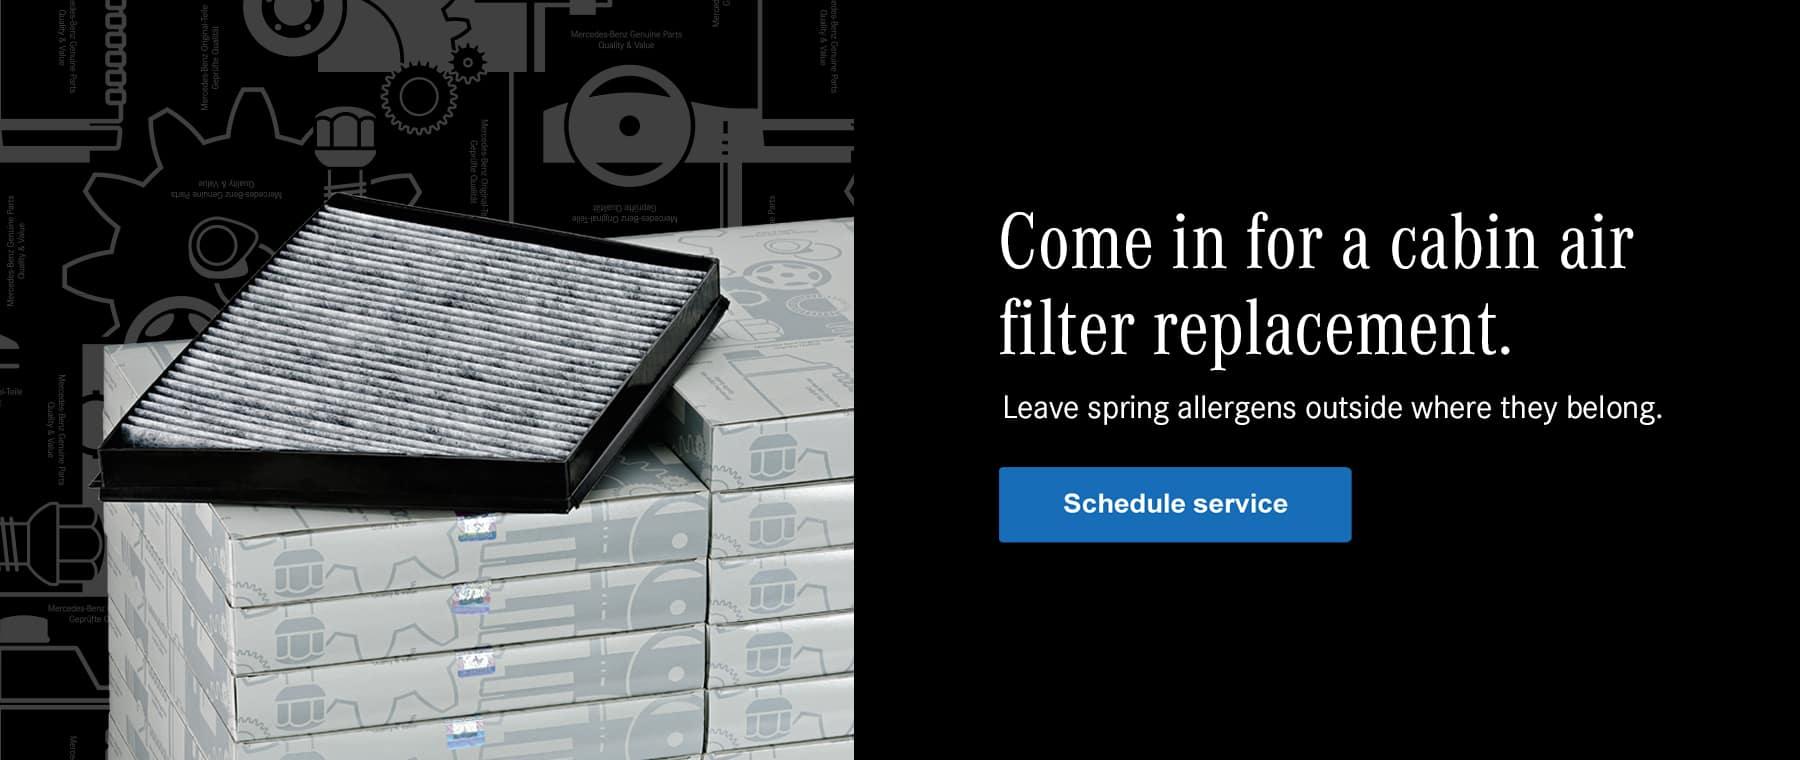 Mercedes-Benz air filter replacement services